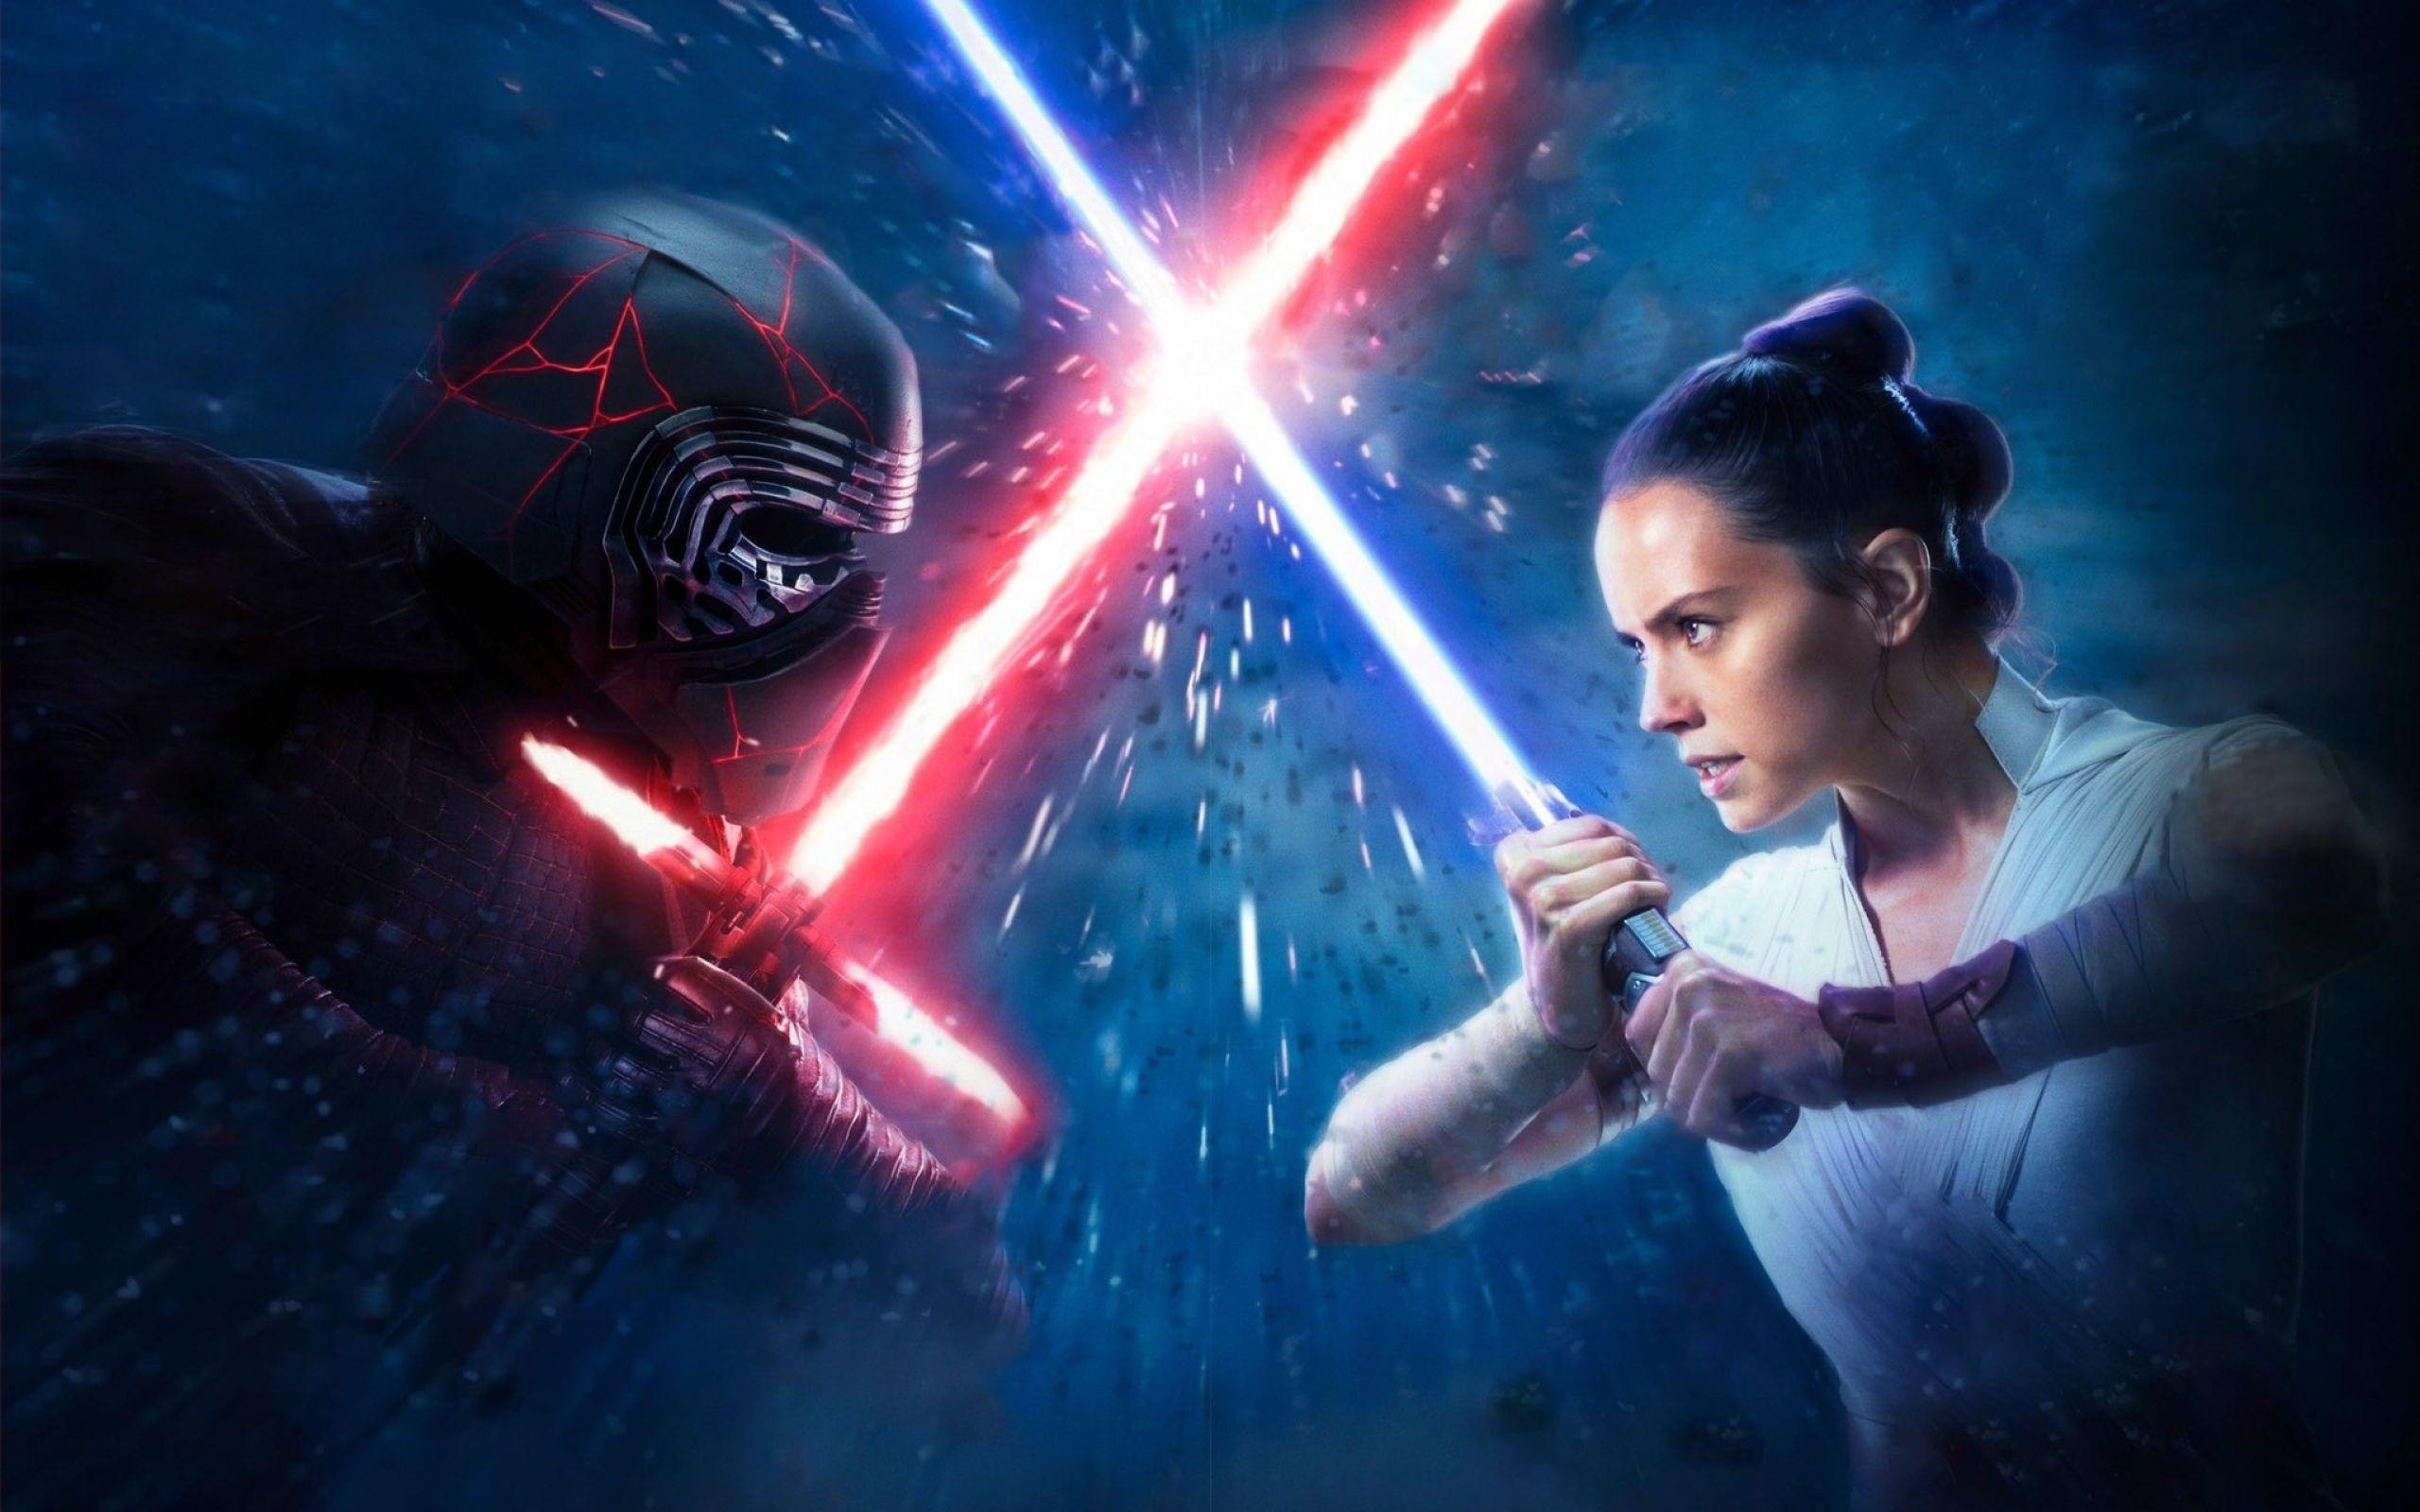 Rey And Kylo Ren Wallpapers Top Free Rey And Kylo Ren Backgrounds Wallpaperaccess